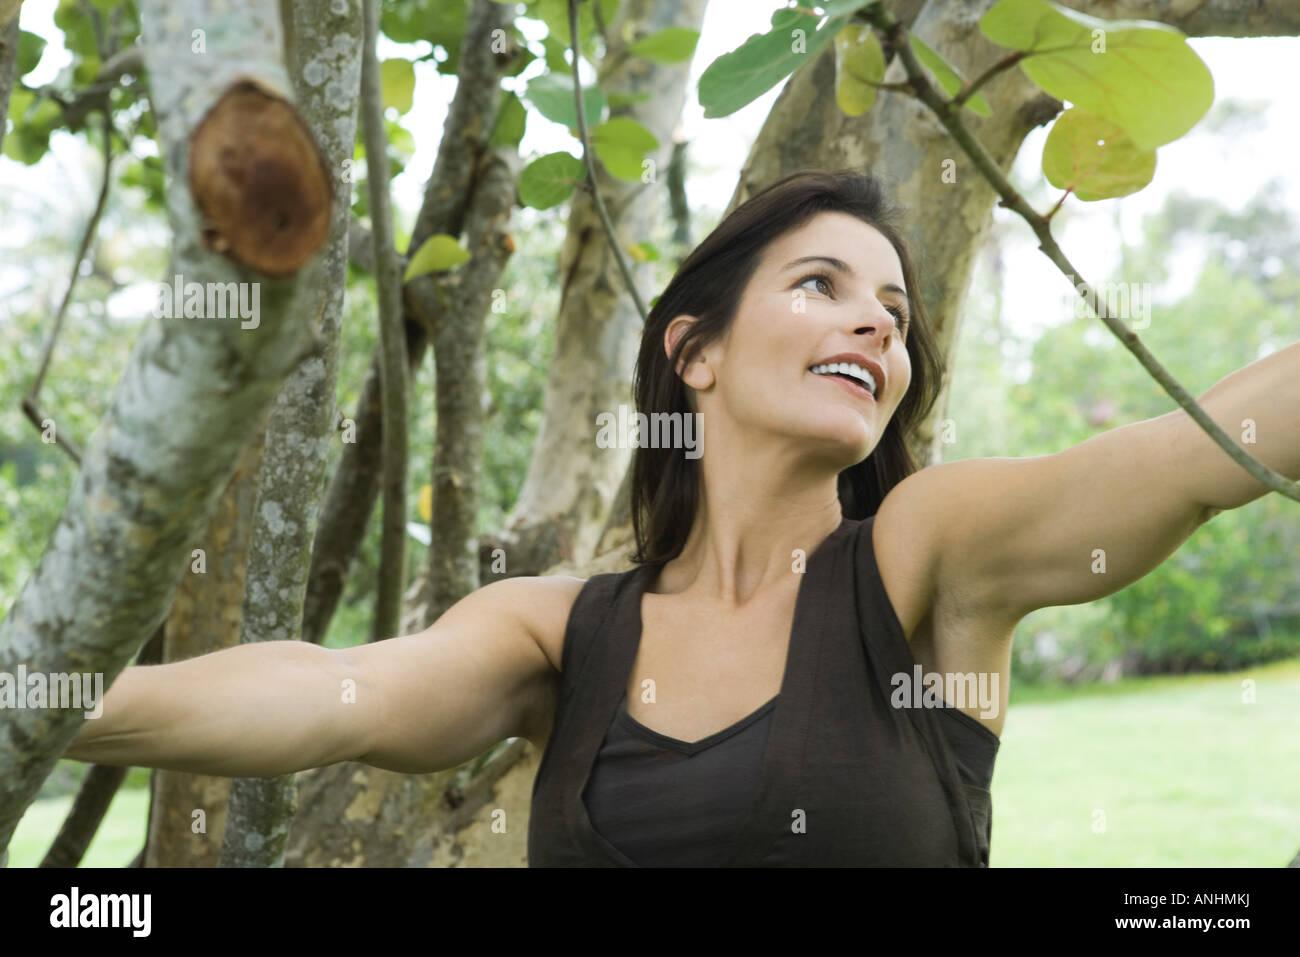 Woman among trees, smiling, looking away - Stock Image